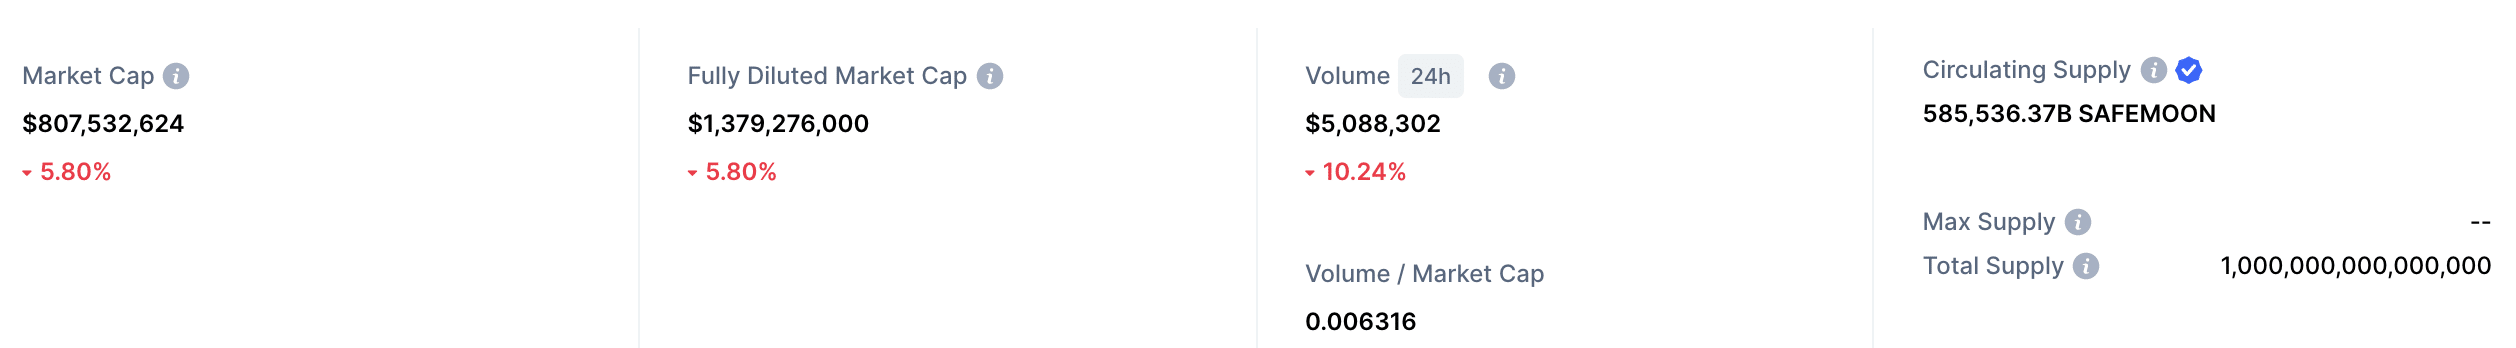 safemoon market cap